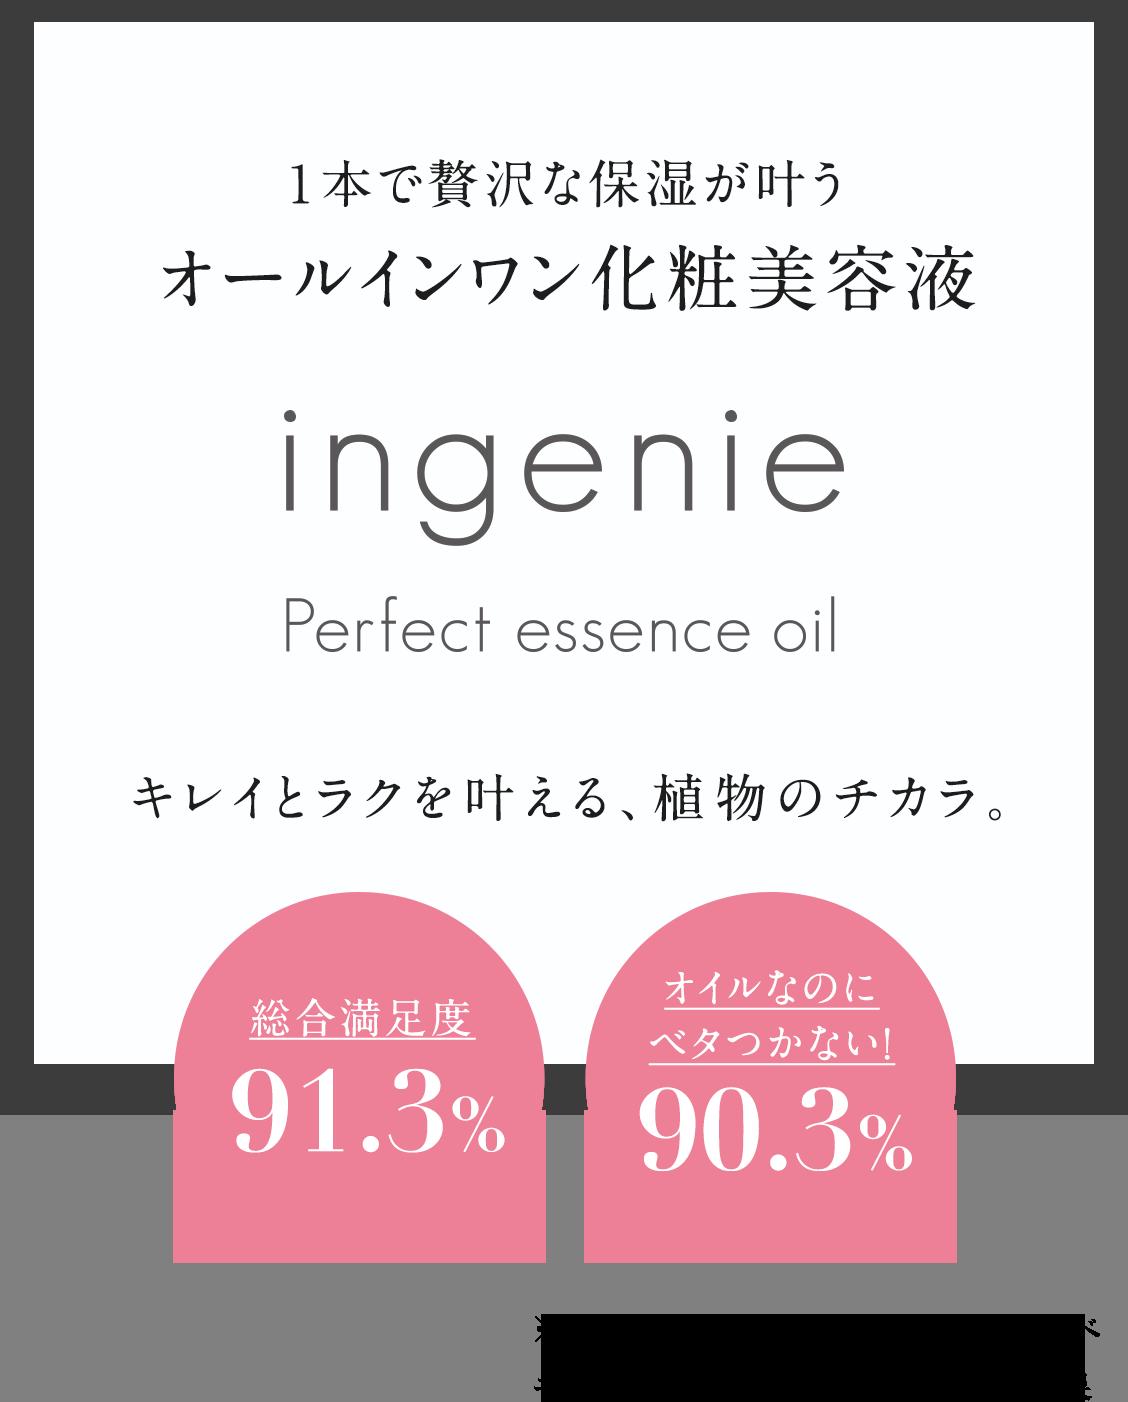 ingenie Perfect essence oil キレイとラクを叶える、植物のチカラ。1本で贅沢な保湿が叶うオールインワン化粧美容液